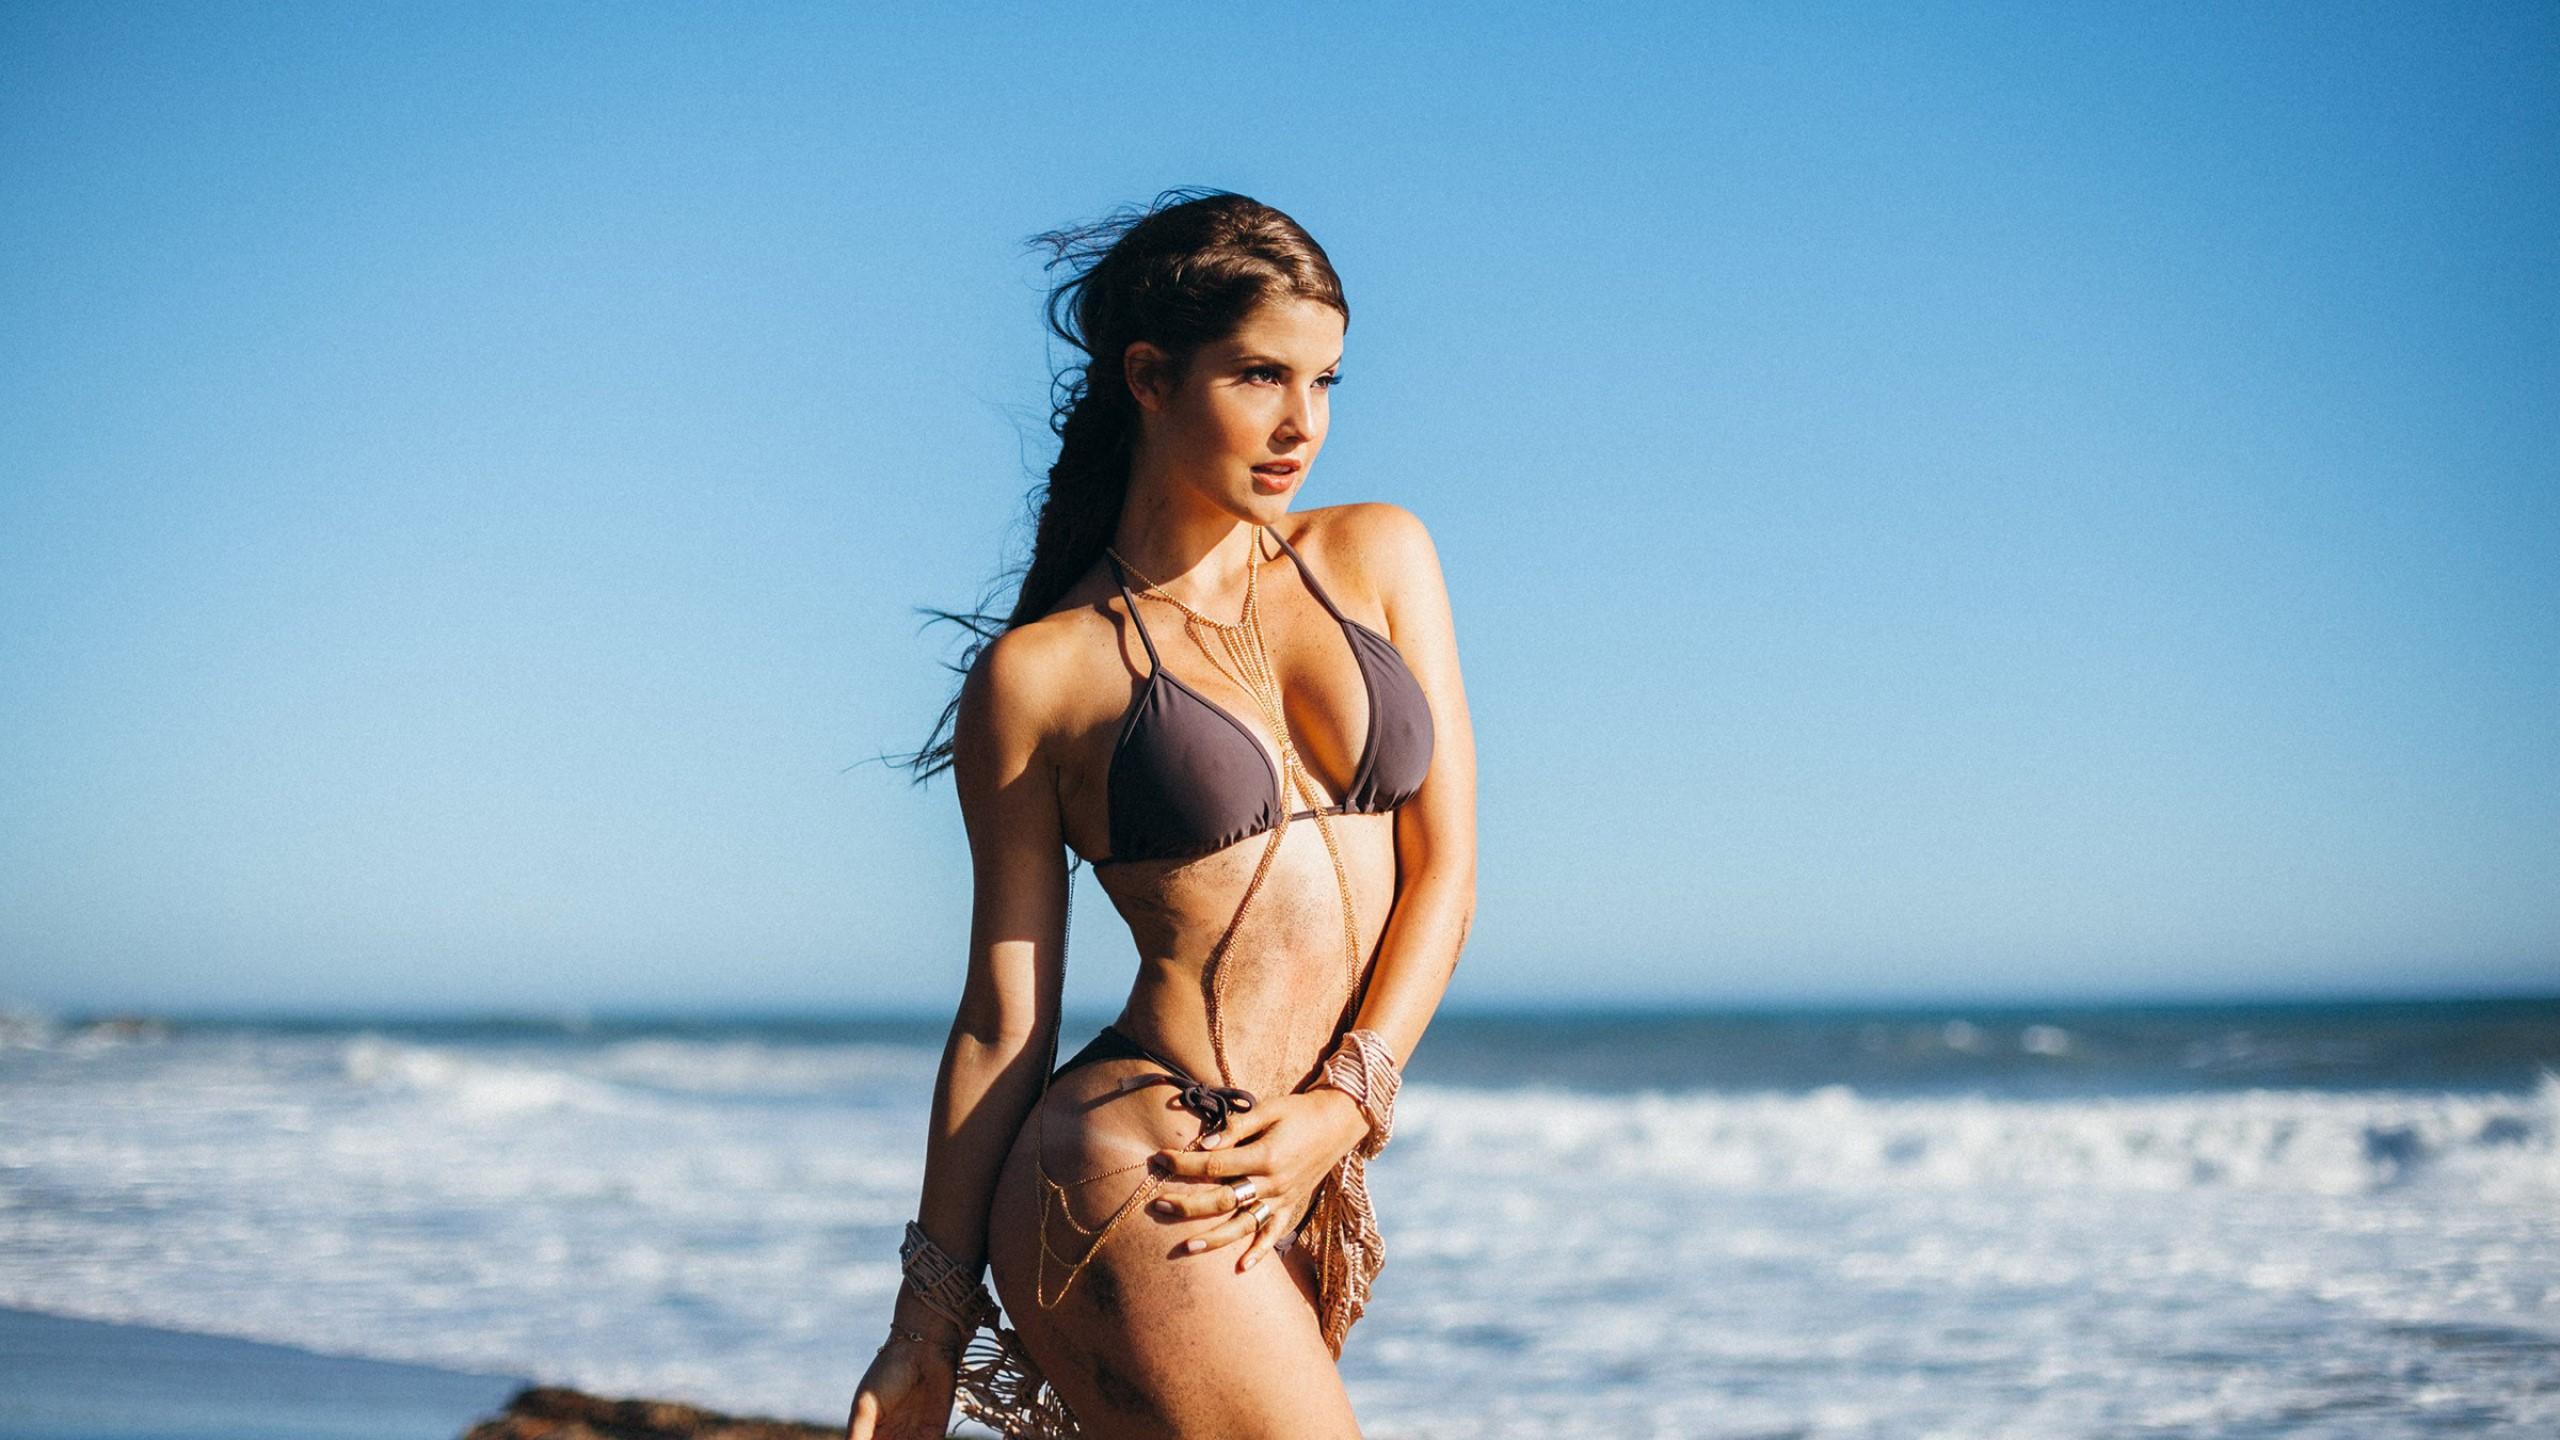 Amanda Cerny 25